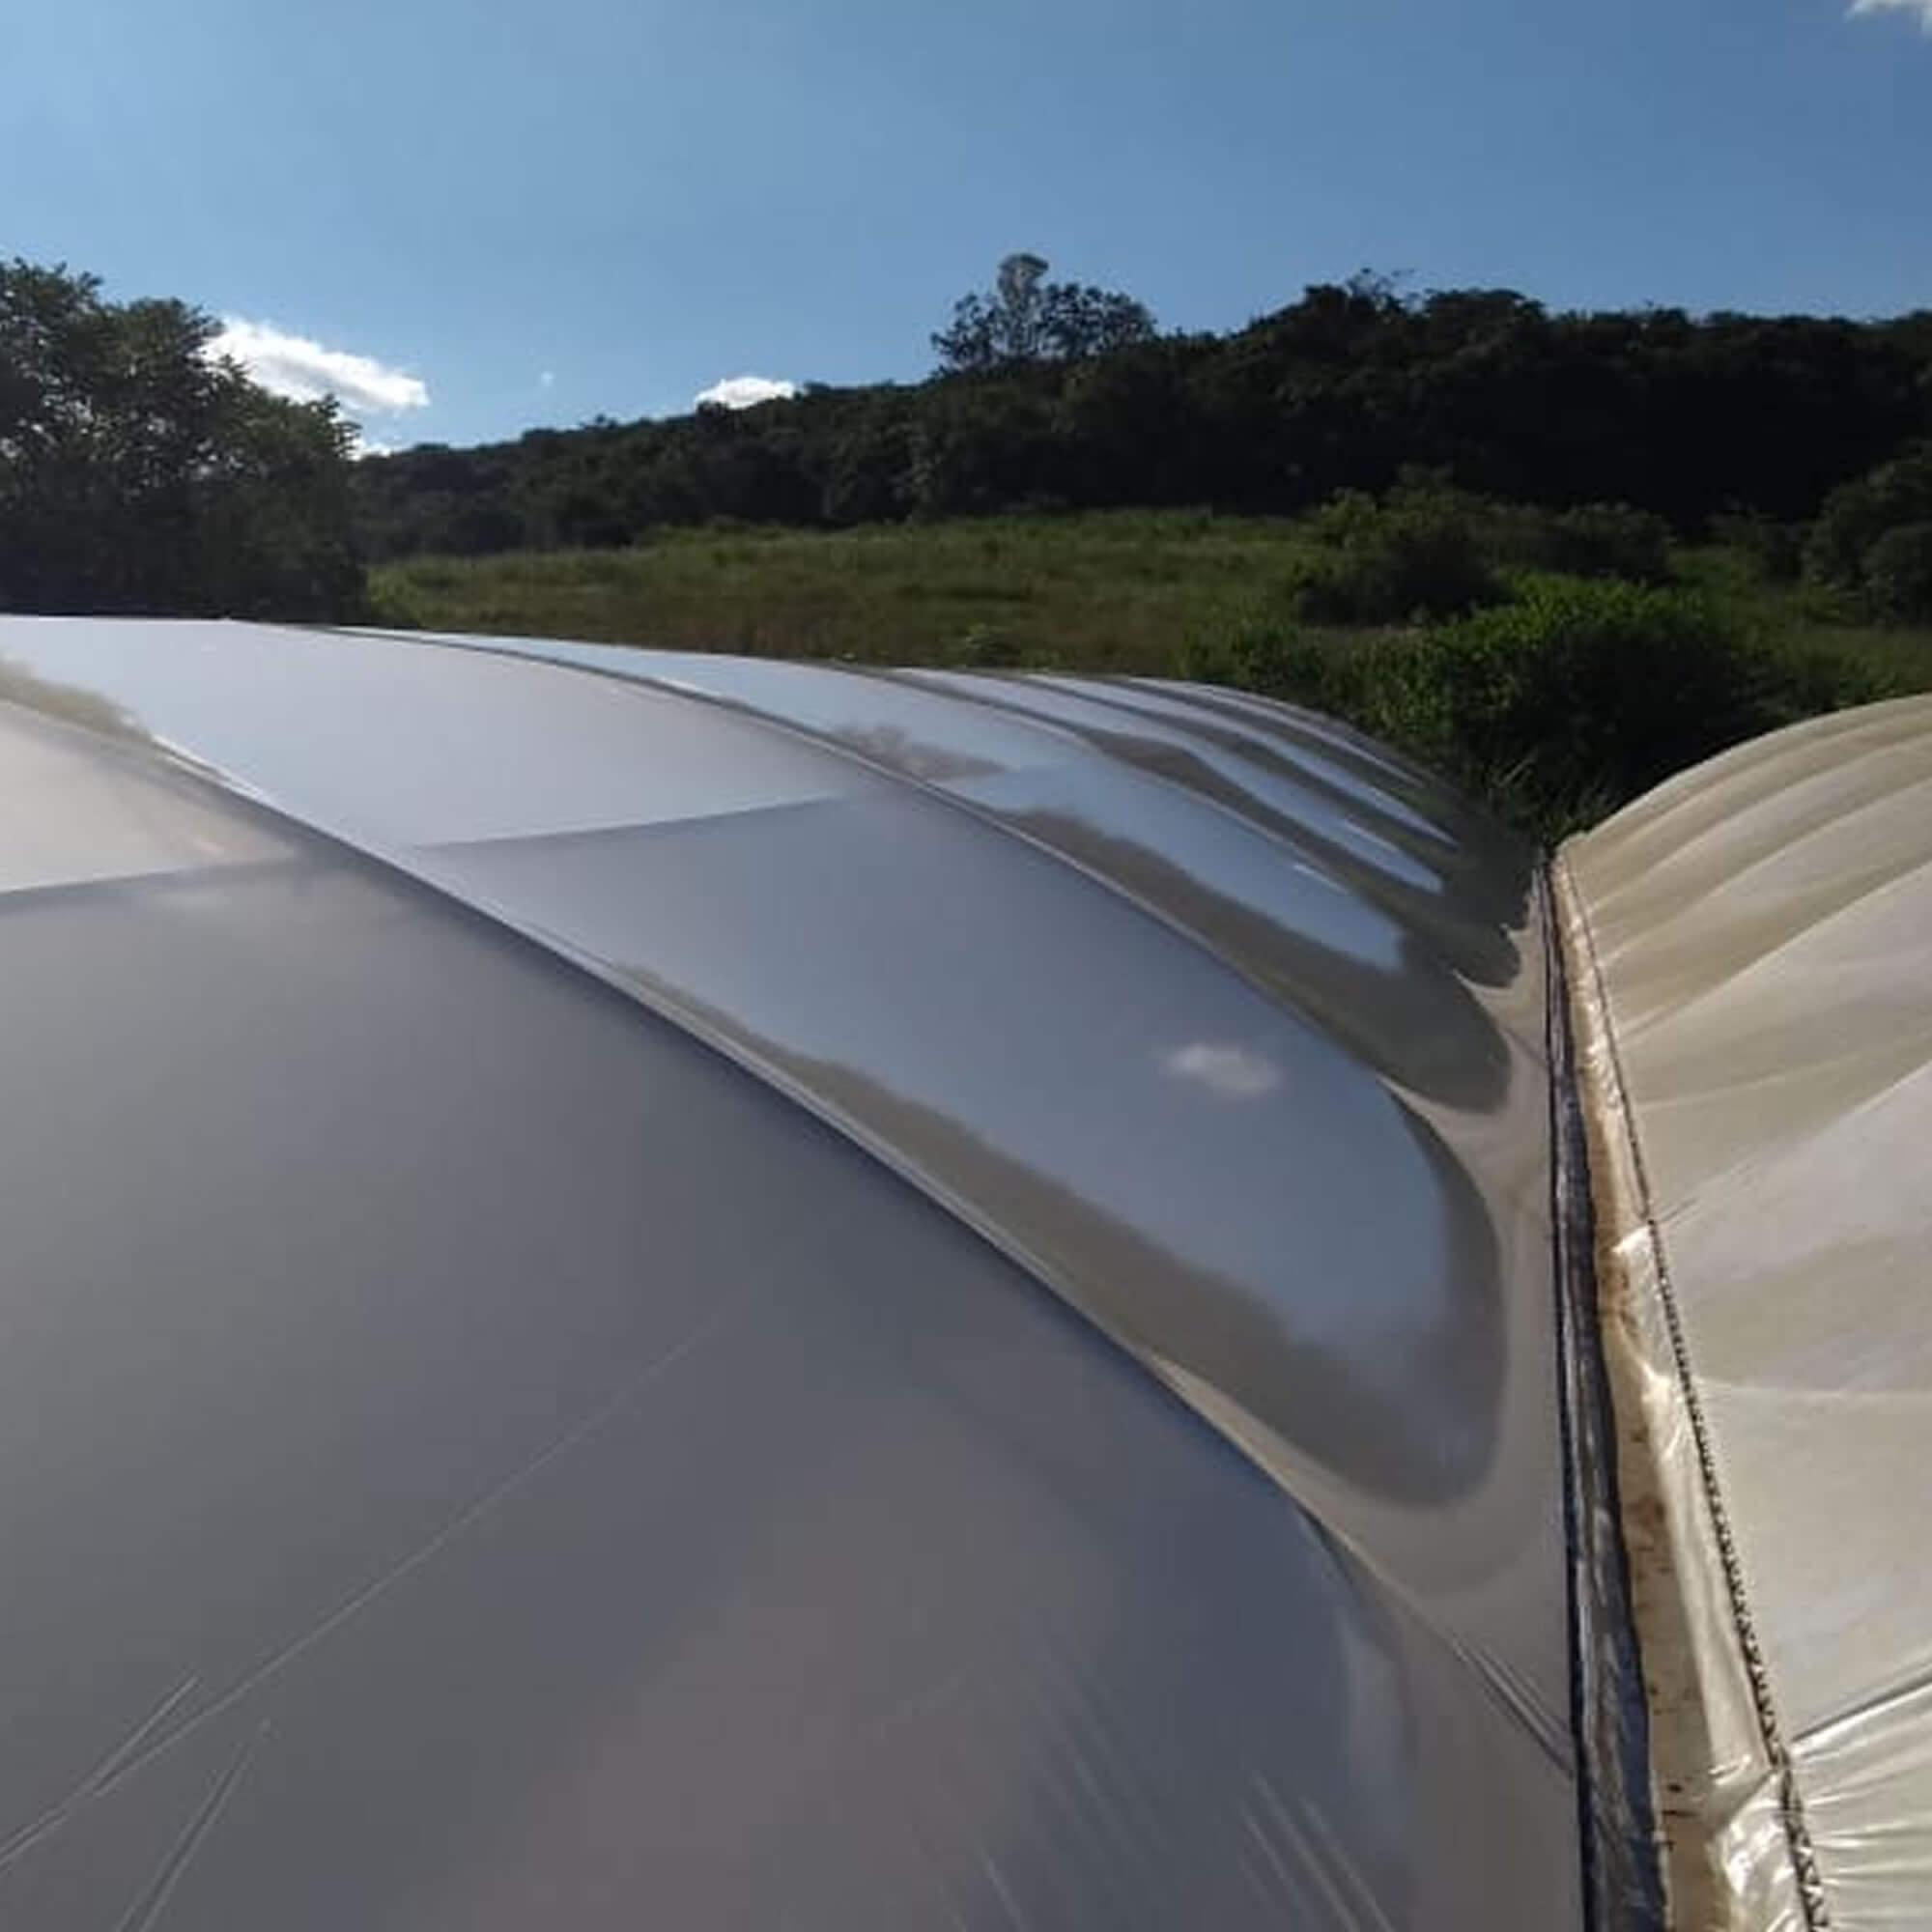 Filme Plástico Difusor para Estufa - 8x105 metros - 90 micras - Politiv